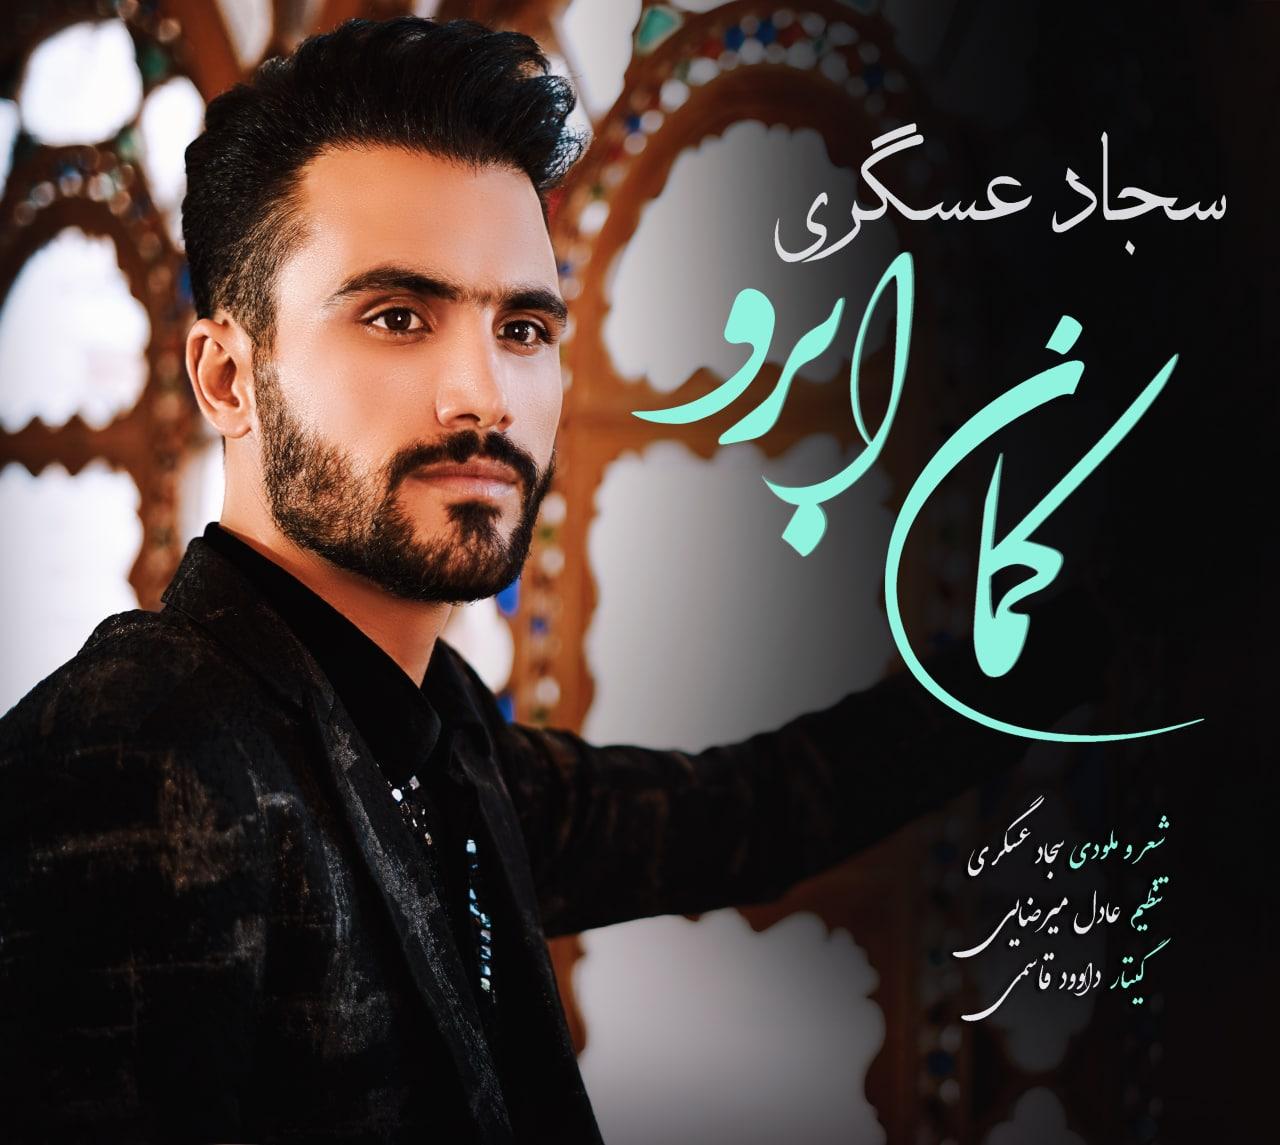 Sajjad Asgari – Kaman Abro